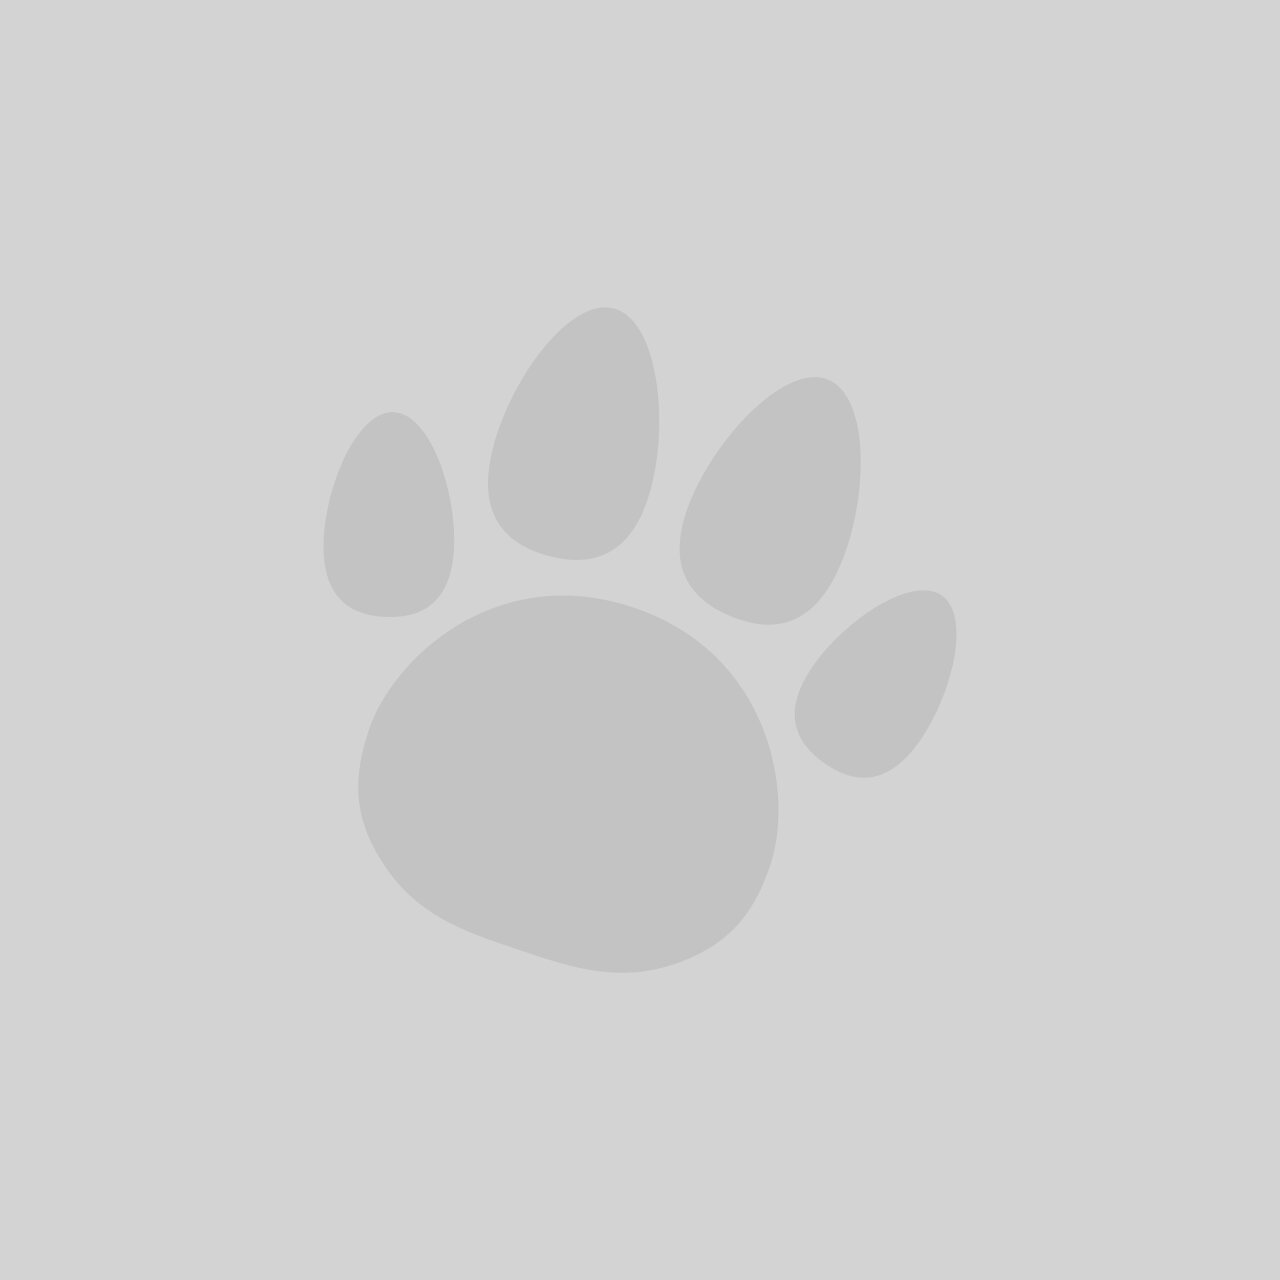 Ezydog Road Runner Dog Lead Orange